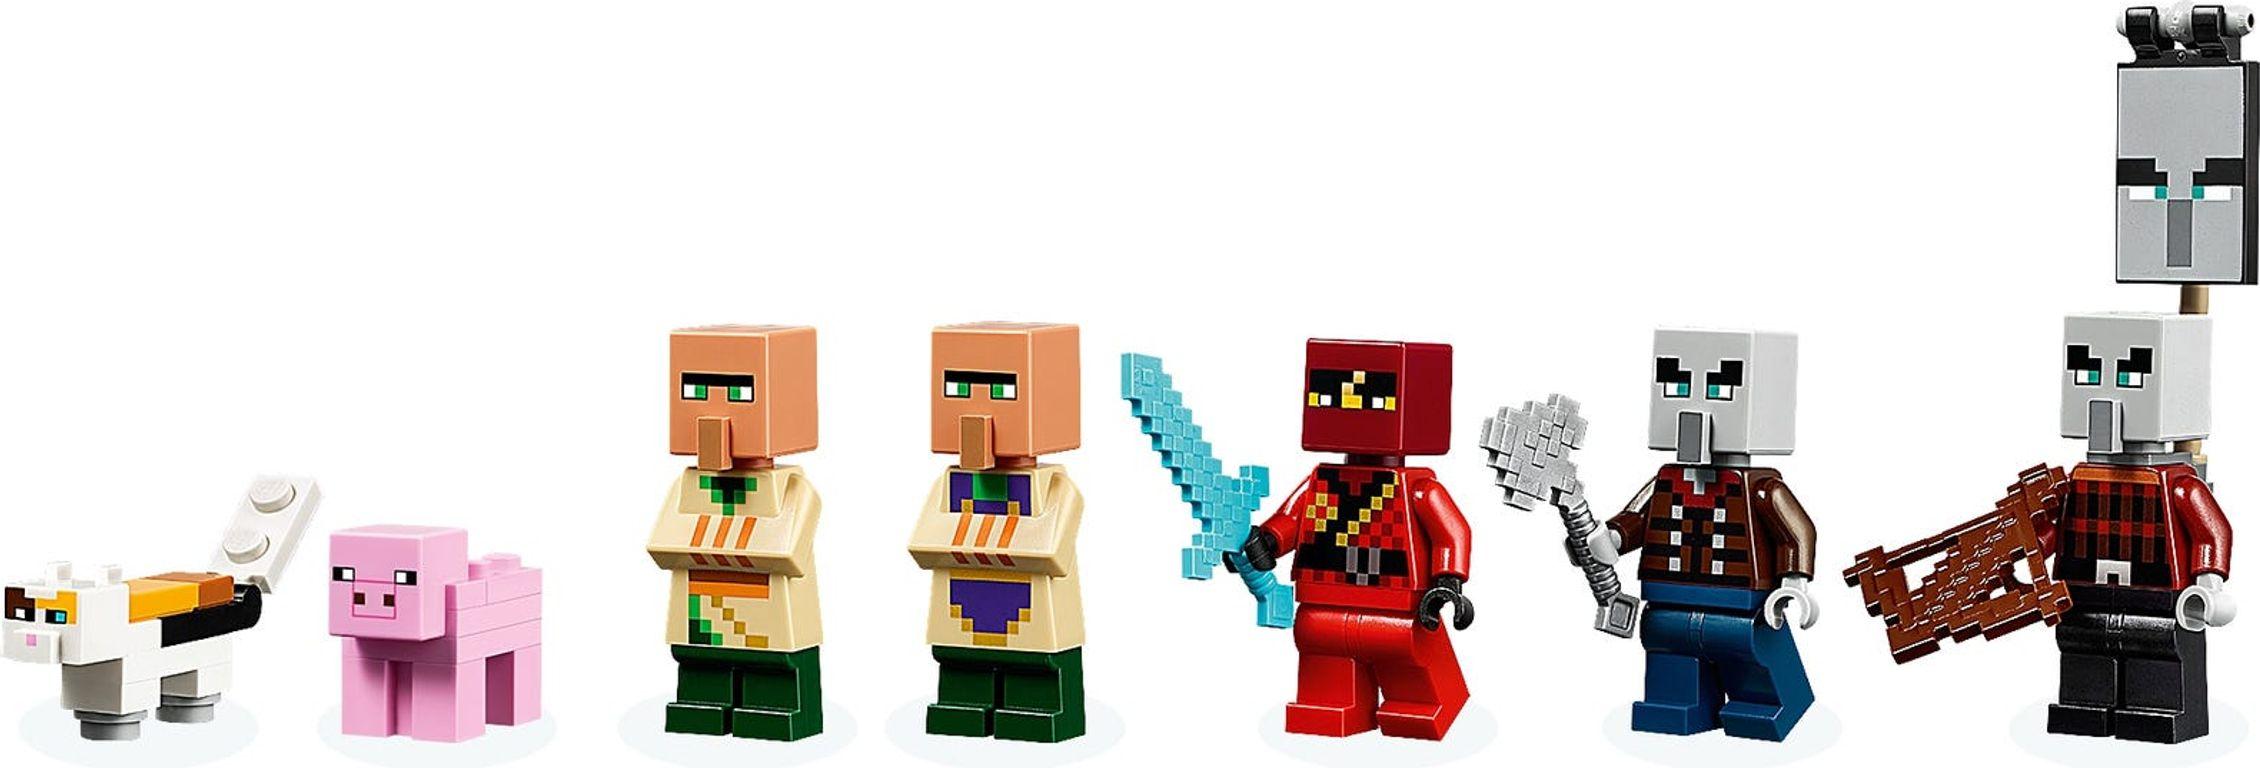 The Illager Raid minifigures